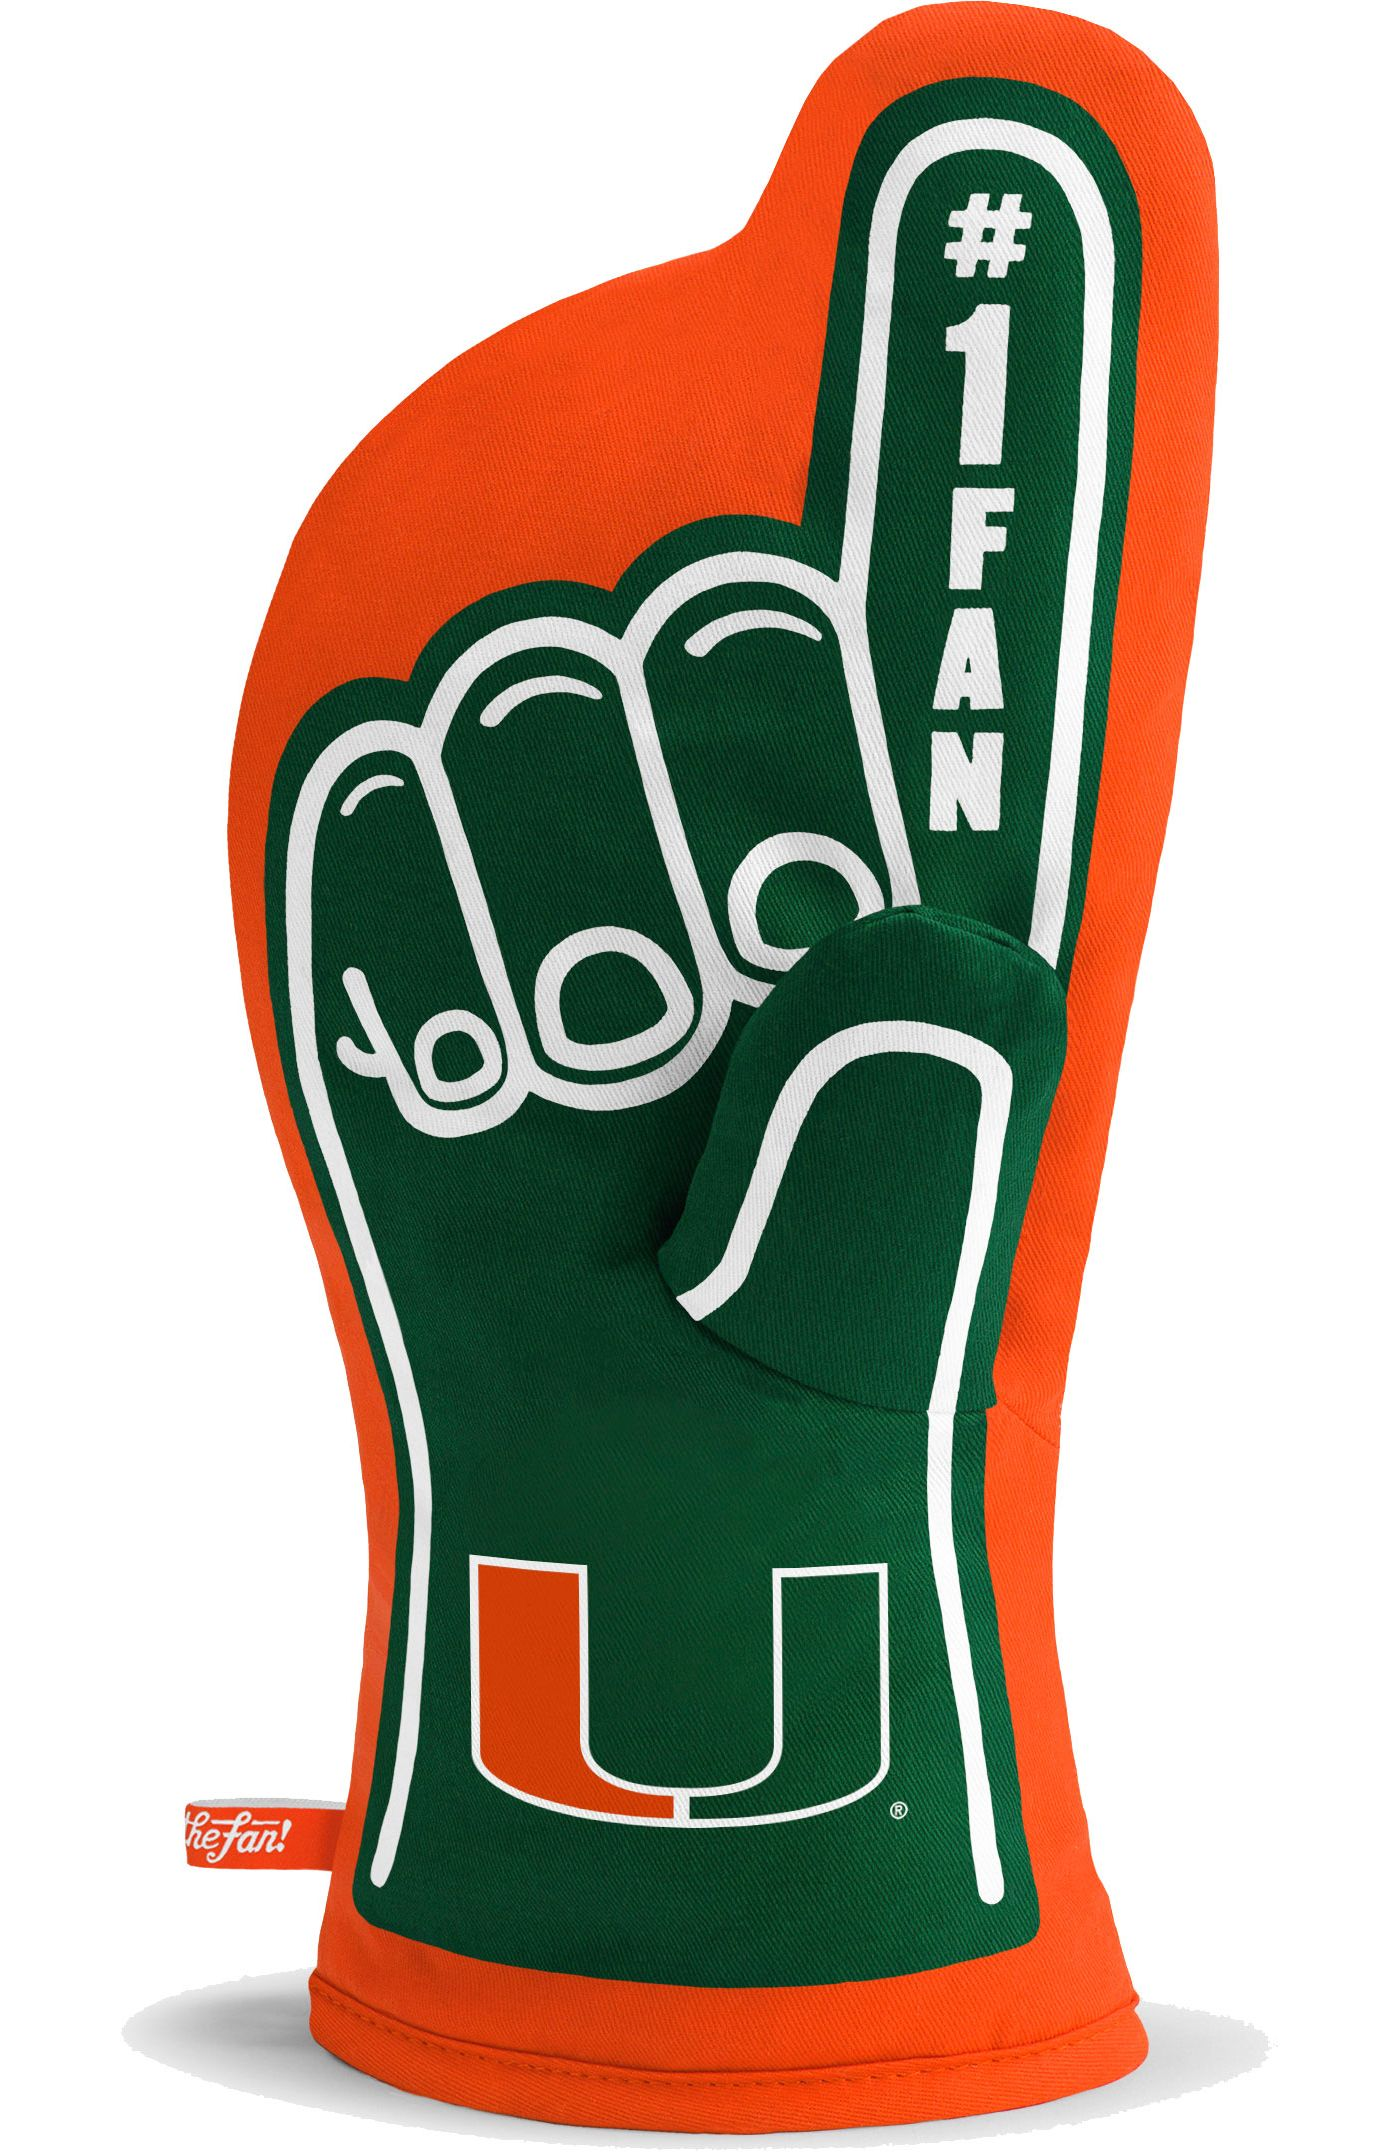 You The Fan Miami Hurricanes #1 Oven Mitt